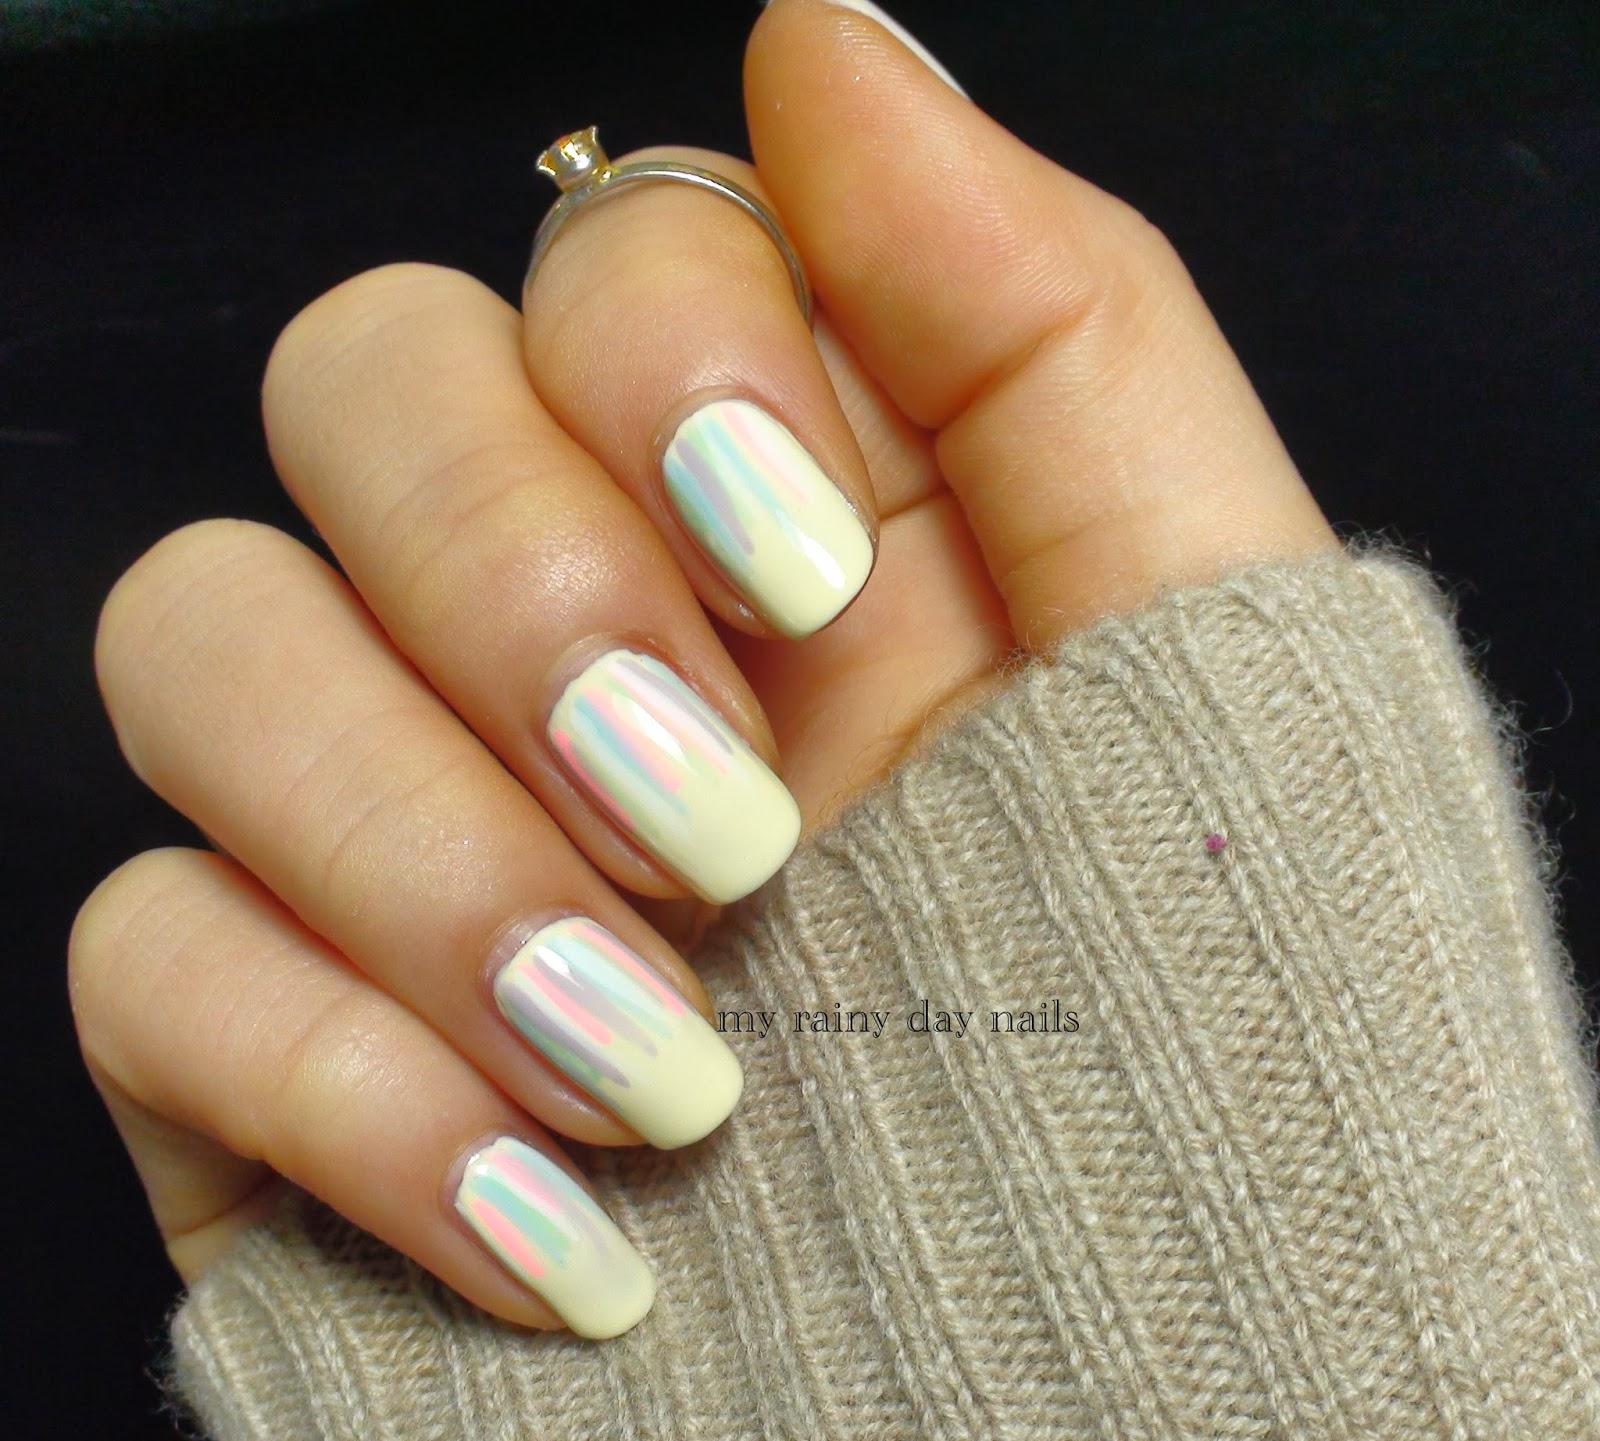 Nail Art February Challenge: My Rainy Day Nails: Nail Art Feb Challenge- Pastel